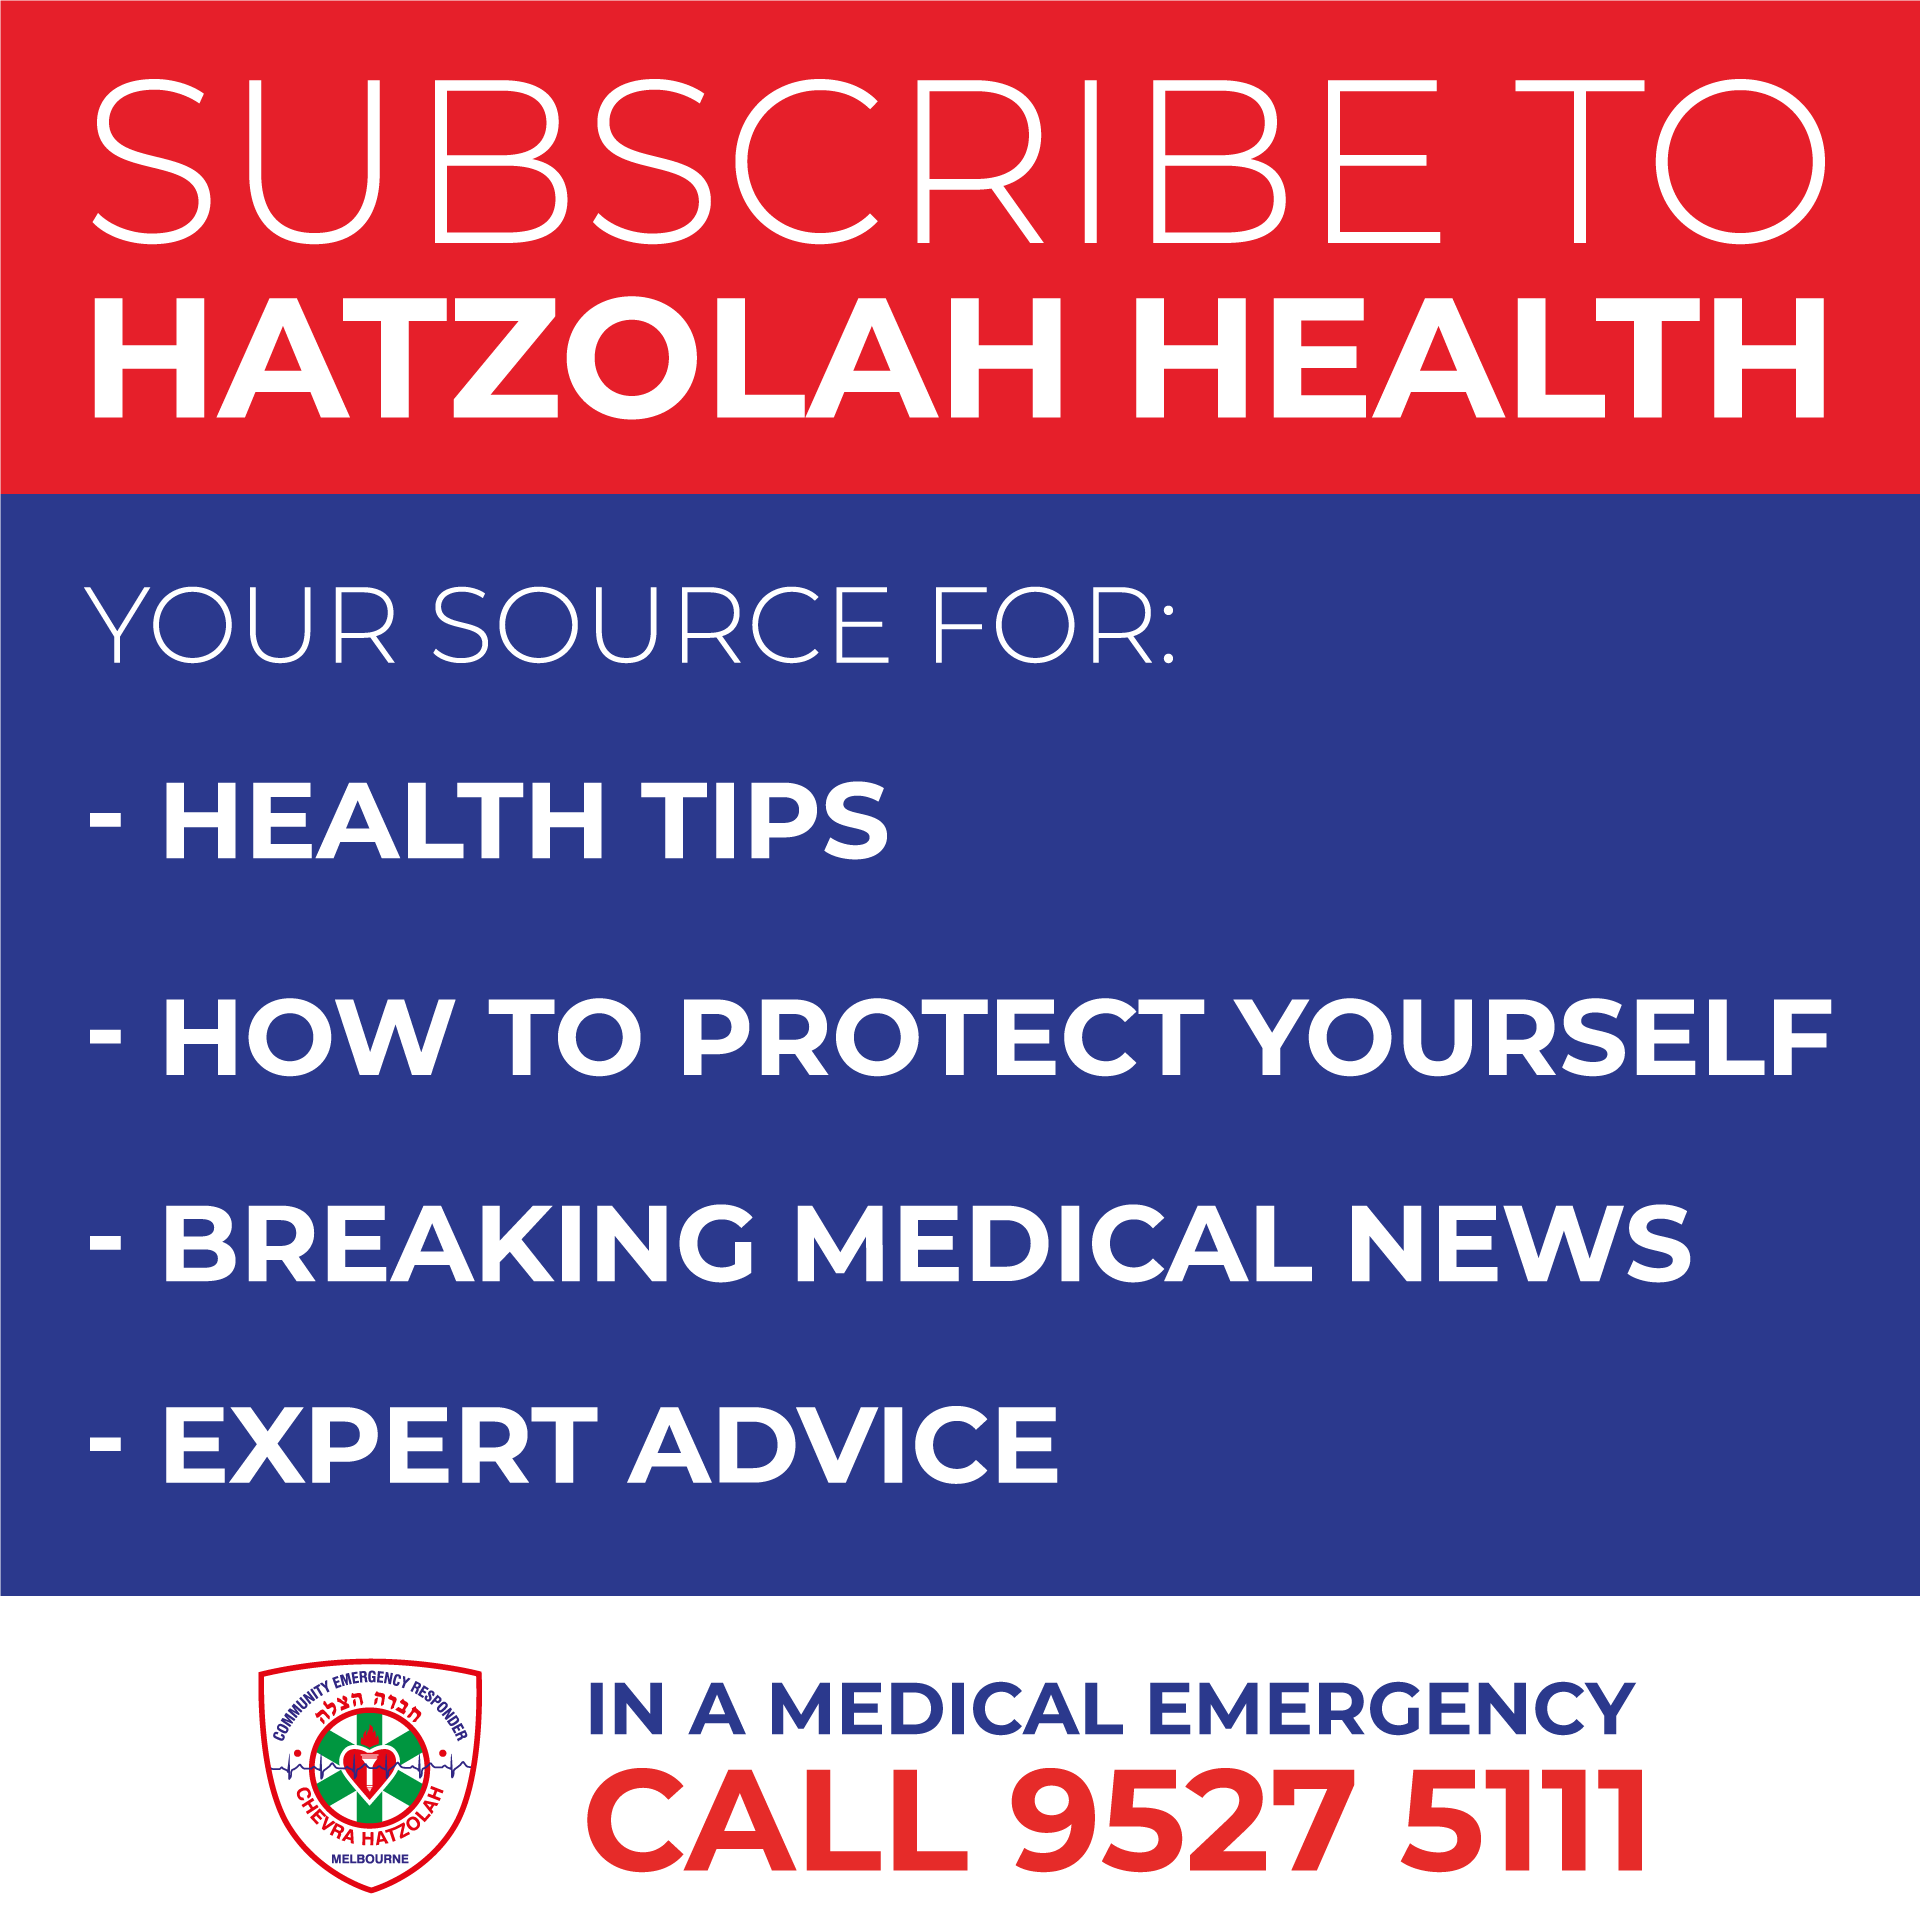 Hatzolah Melbourne Subscribe to Hatzolah Health